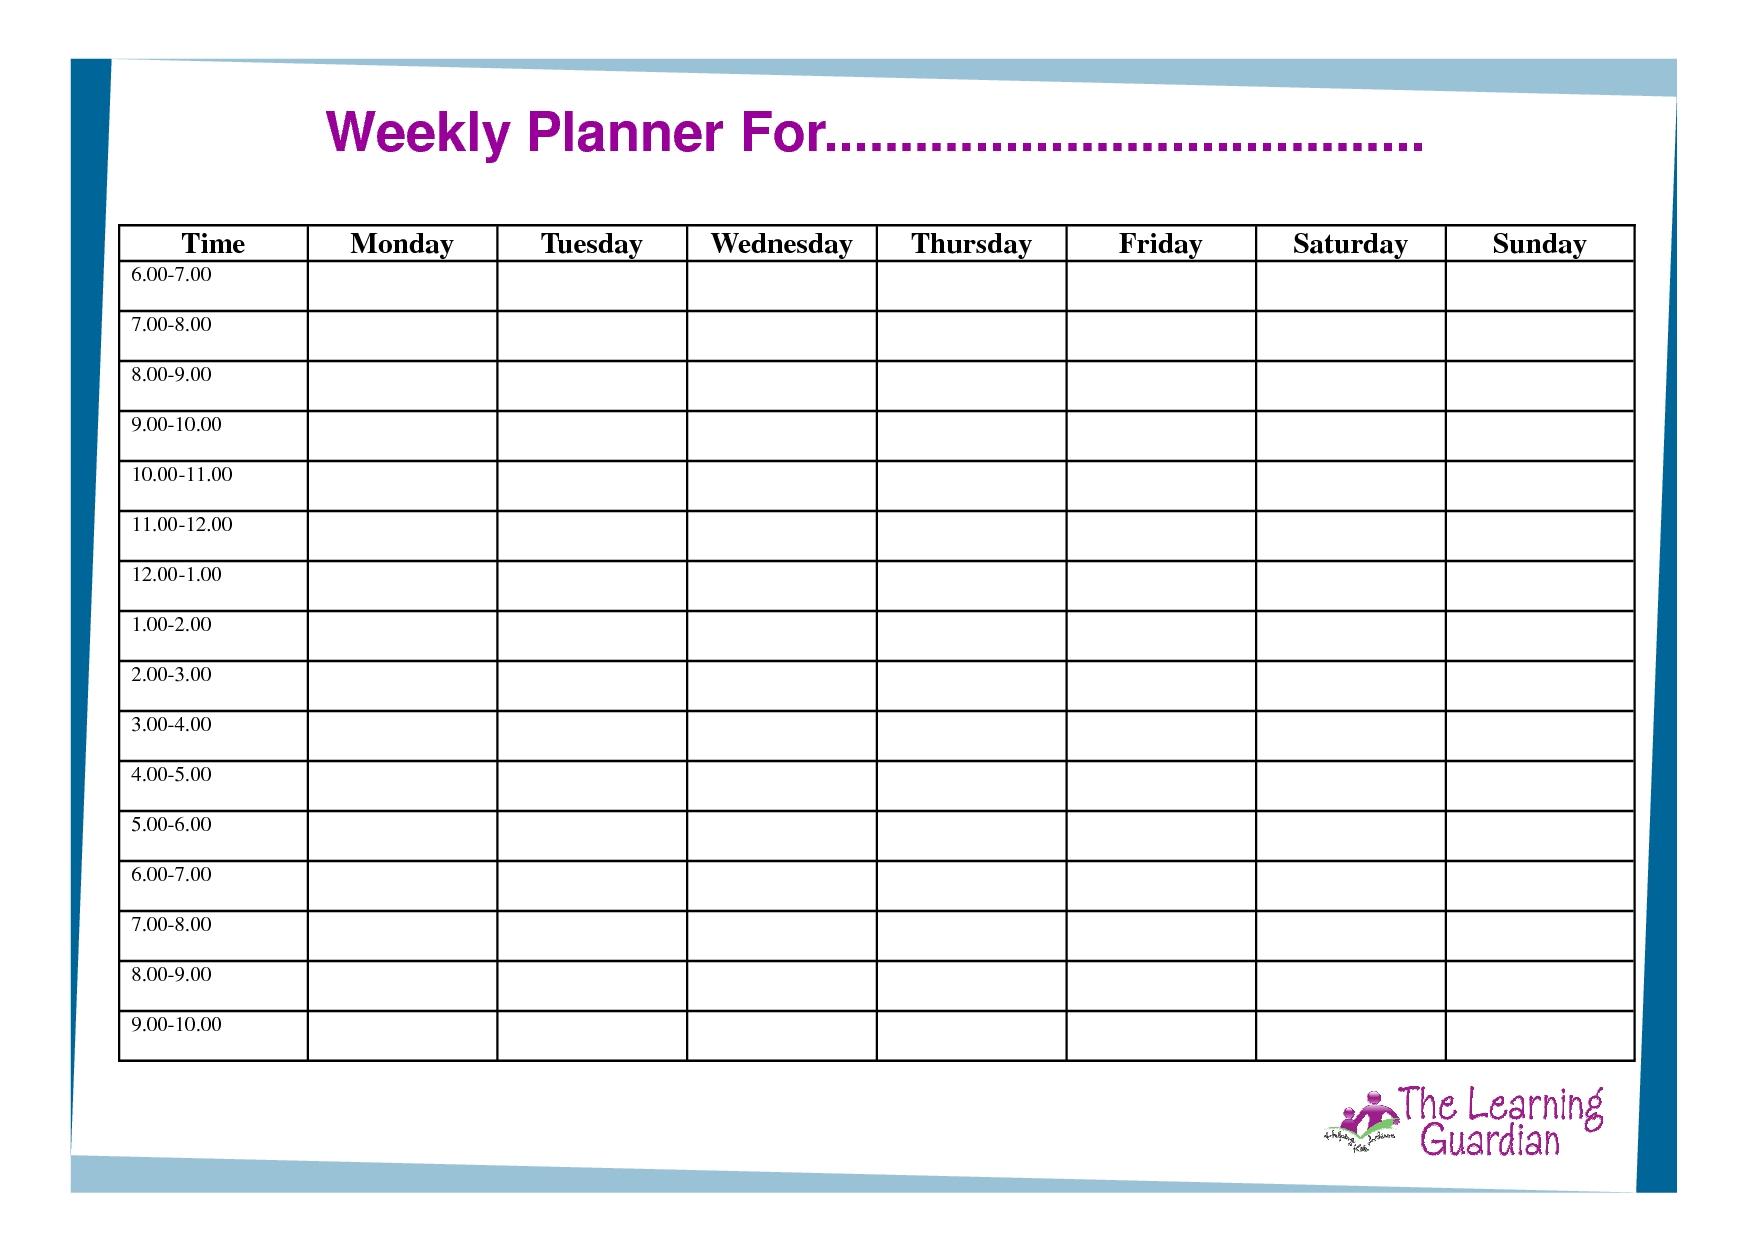 One Week Calendar With Hours - Calendar Inspiration Design One Week Calendar To Type In